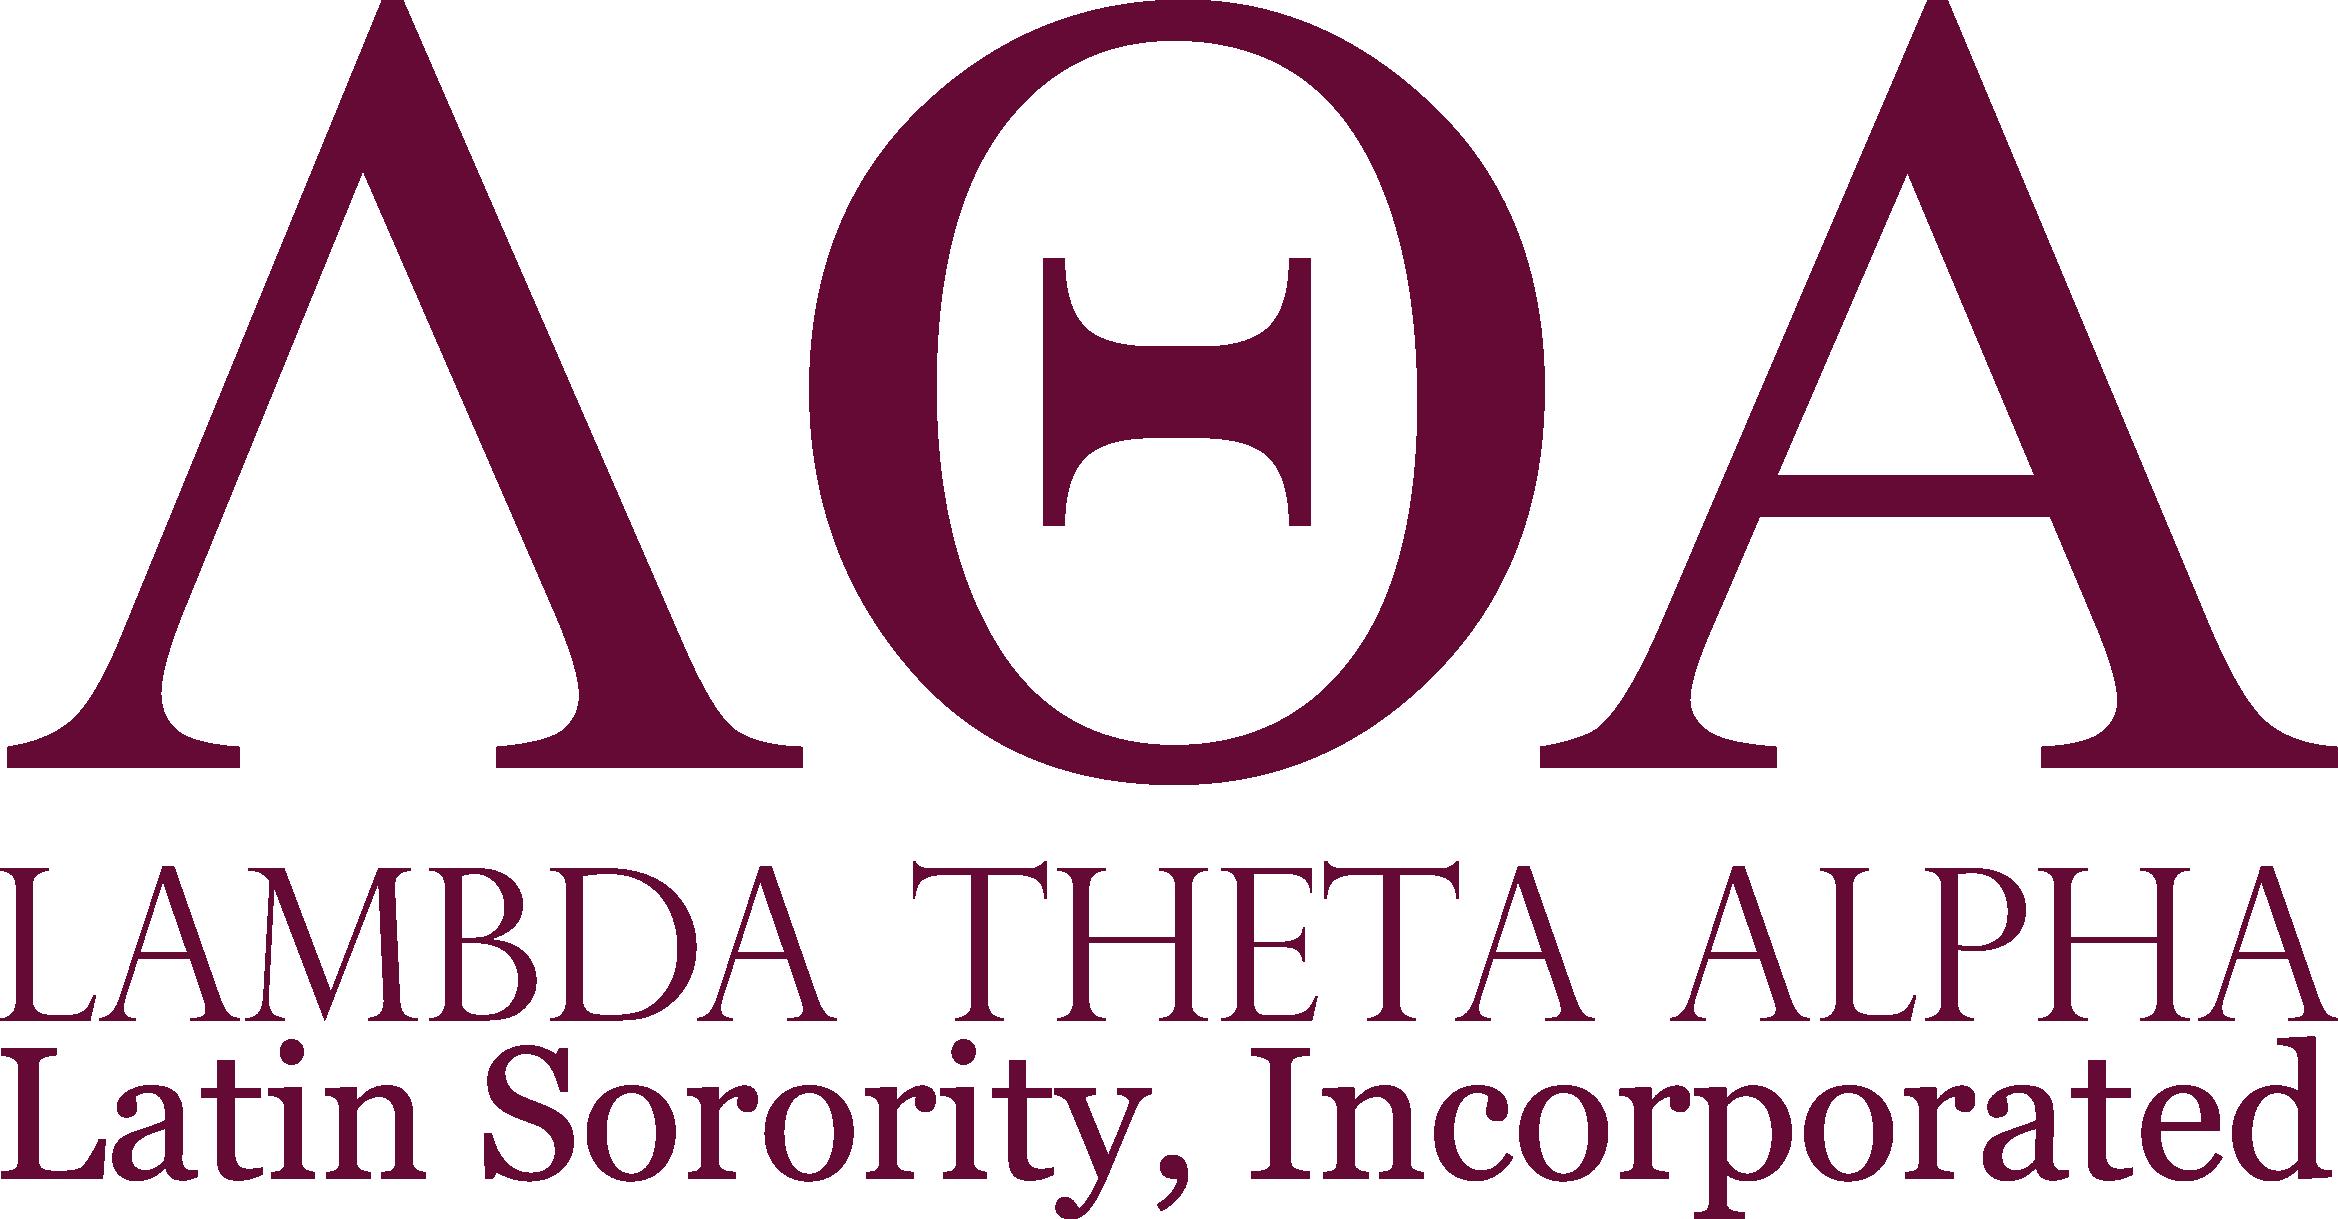 Palm clipart lambda theta alpha. University student union